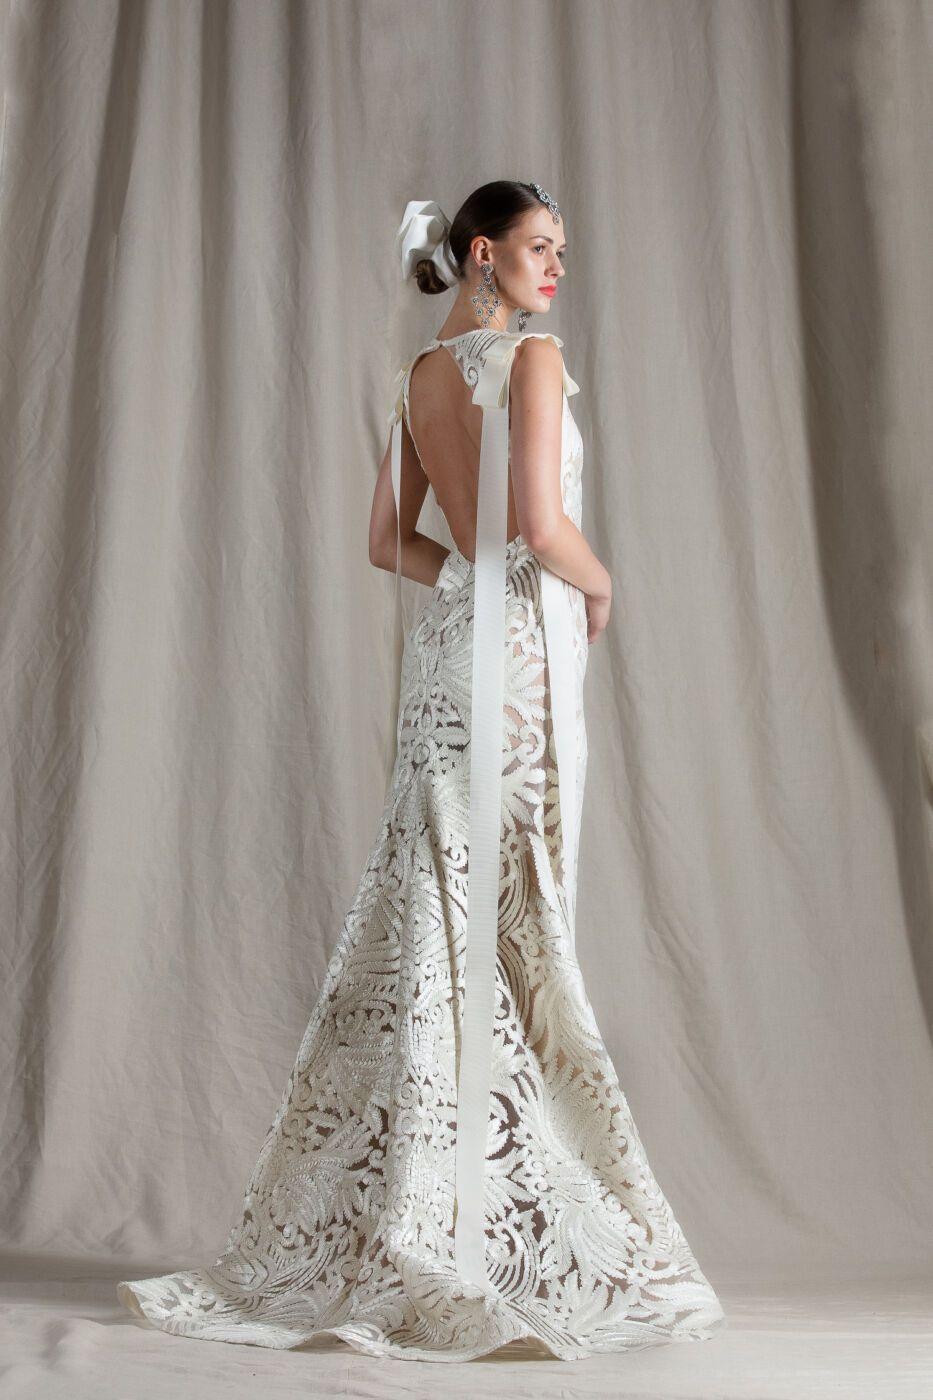 https://www.weddingmagazine.com.ua/wp-content/uploads/2021/04/naeem-khan-bridal-spring-2022-13.jpg